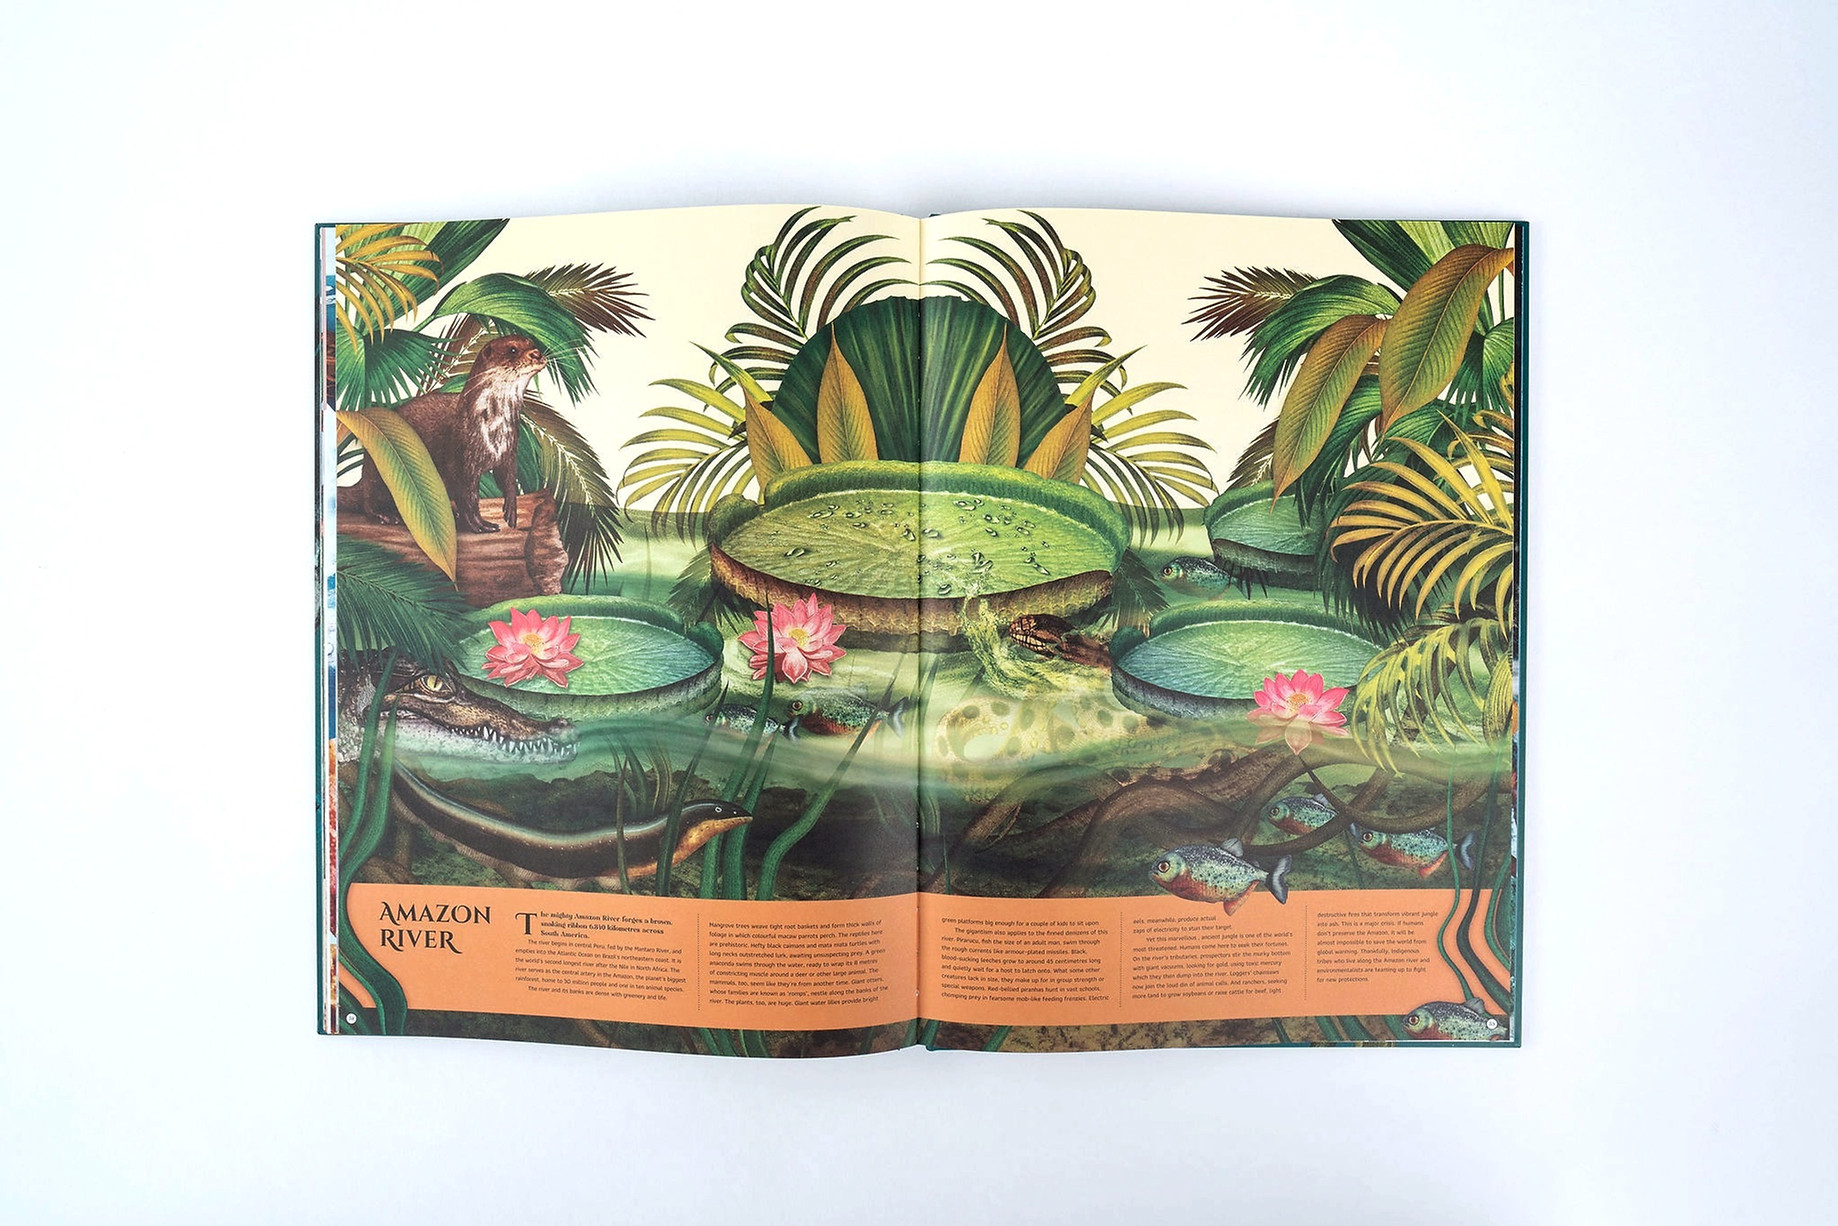 MAG1851-MagicCatPublishing-Books1246_edi